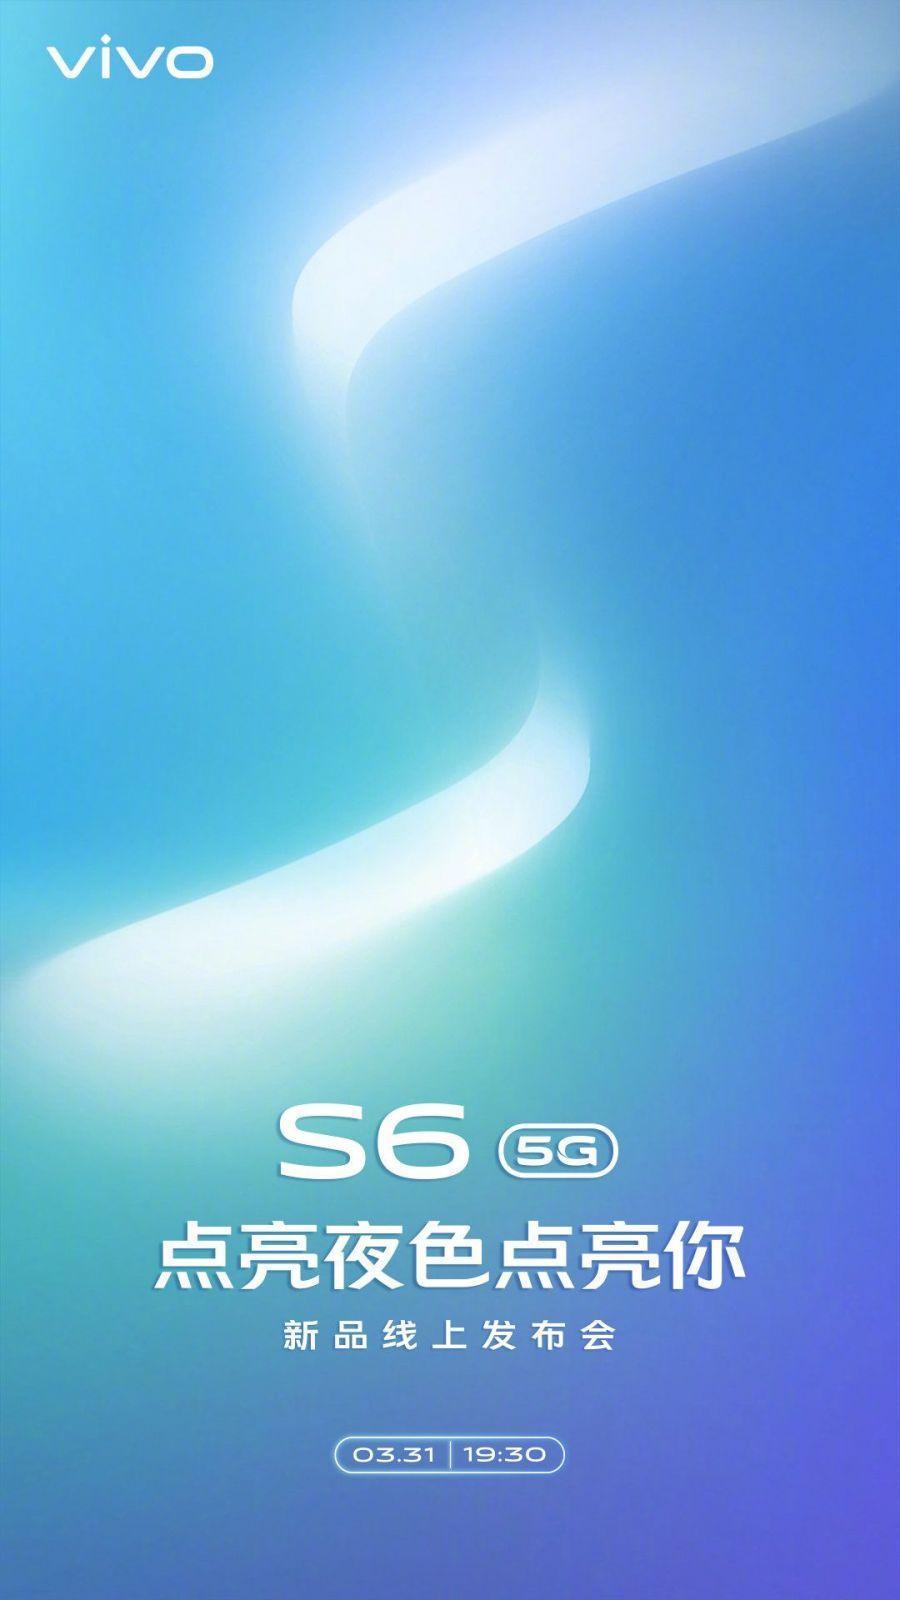 Vivo S6 5G 31 марта